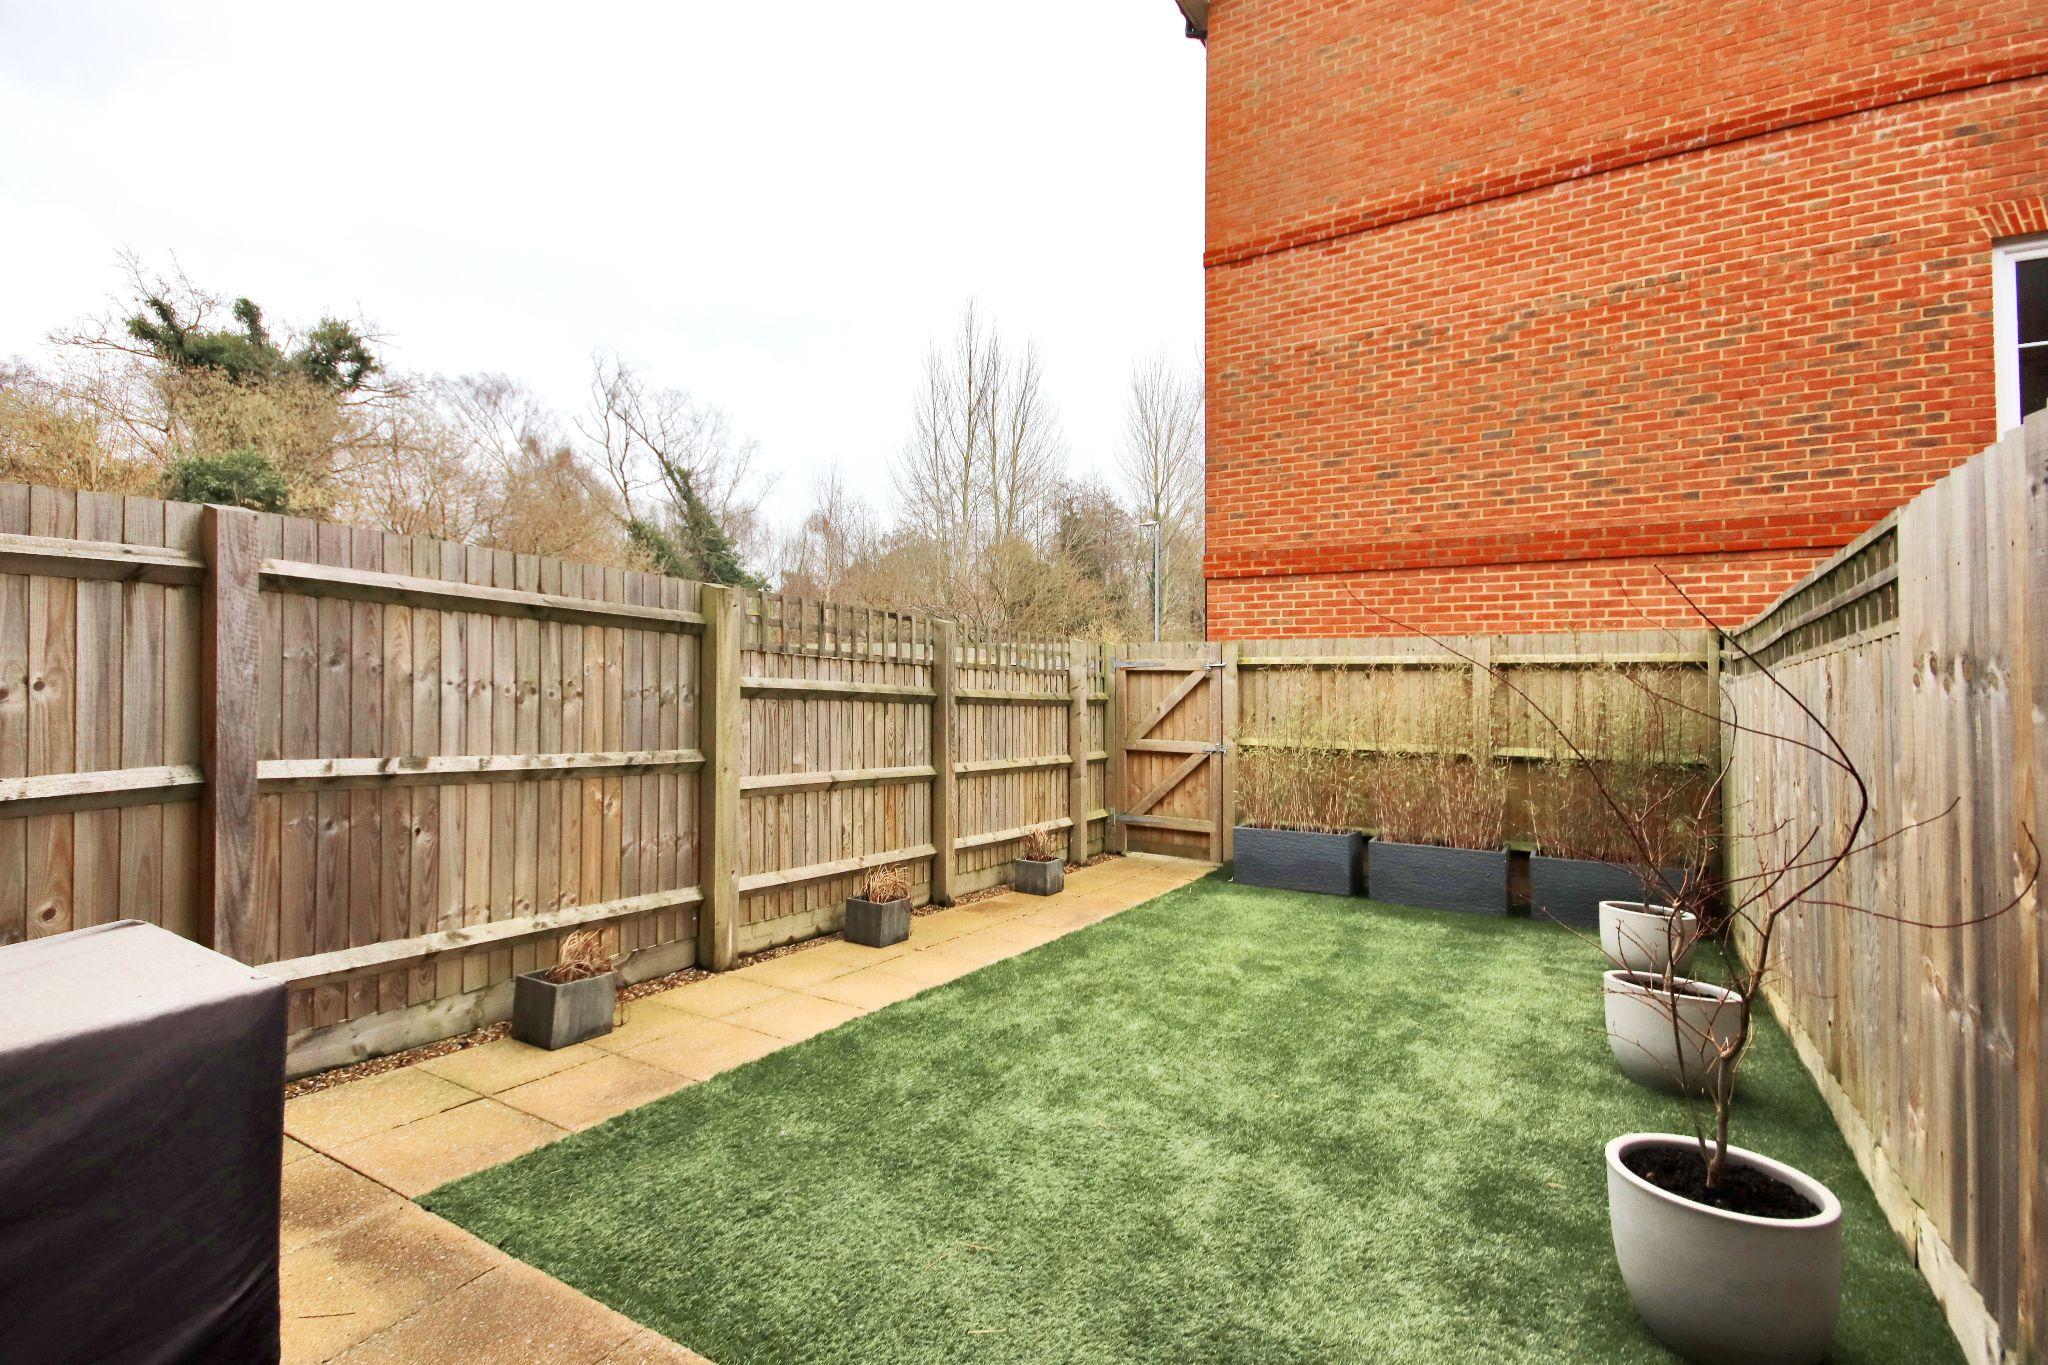 3 bedroom mid terraced house Sold in Sevenoaks - Photograph 13